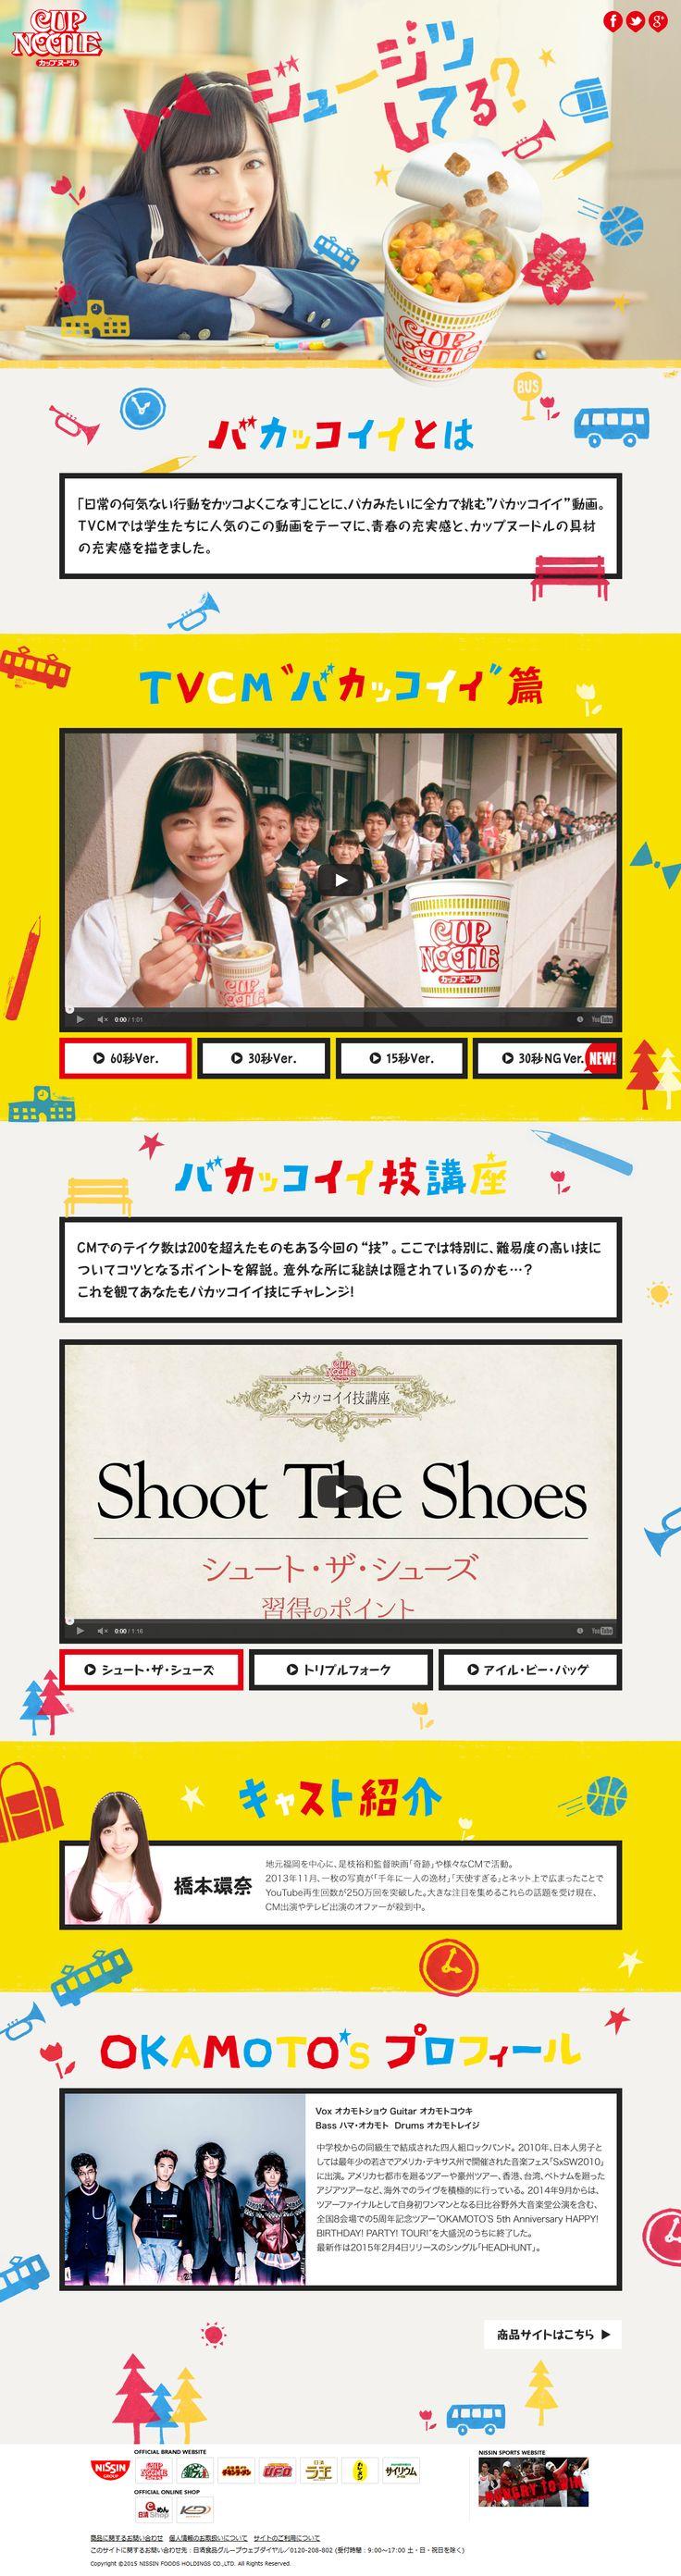 http://www.cupnoodle.jp/bakakkoii/